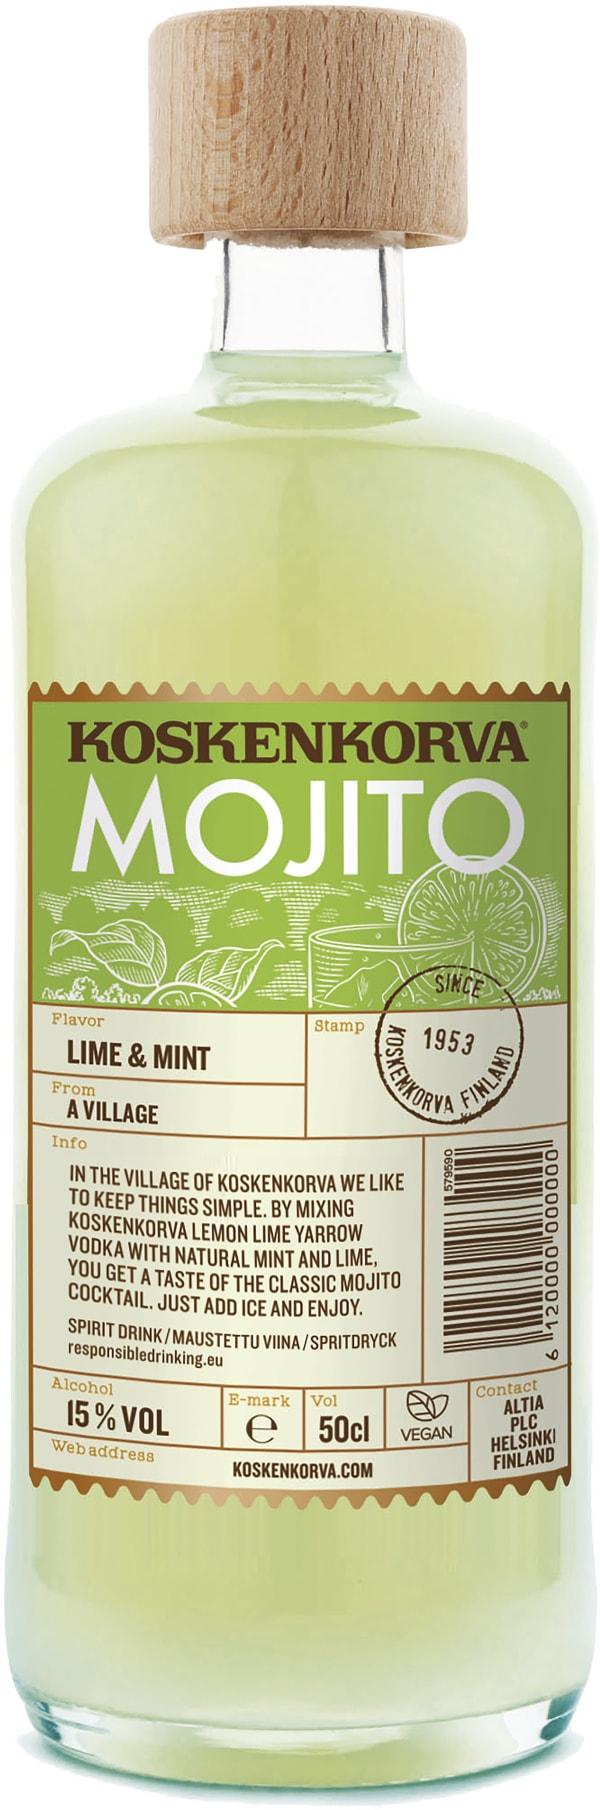 Koskenkorva Mojito